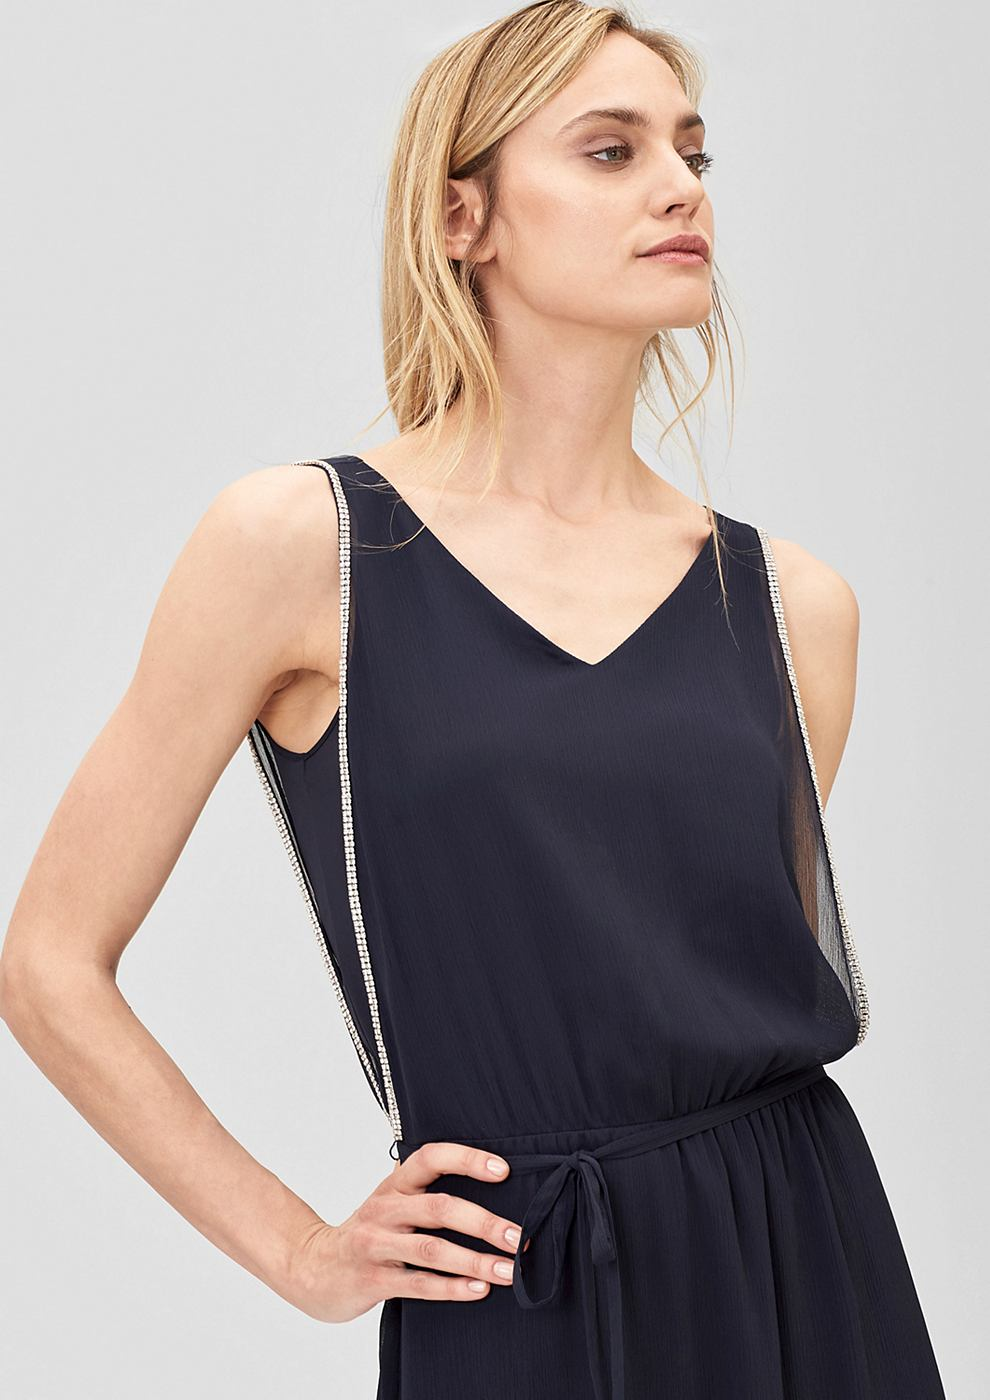 s.Oliver Premium Crepe jurk met sierrandjes met stras blauw